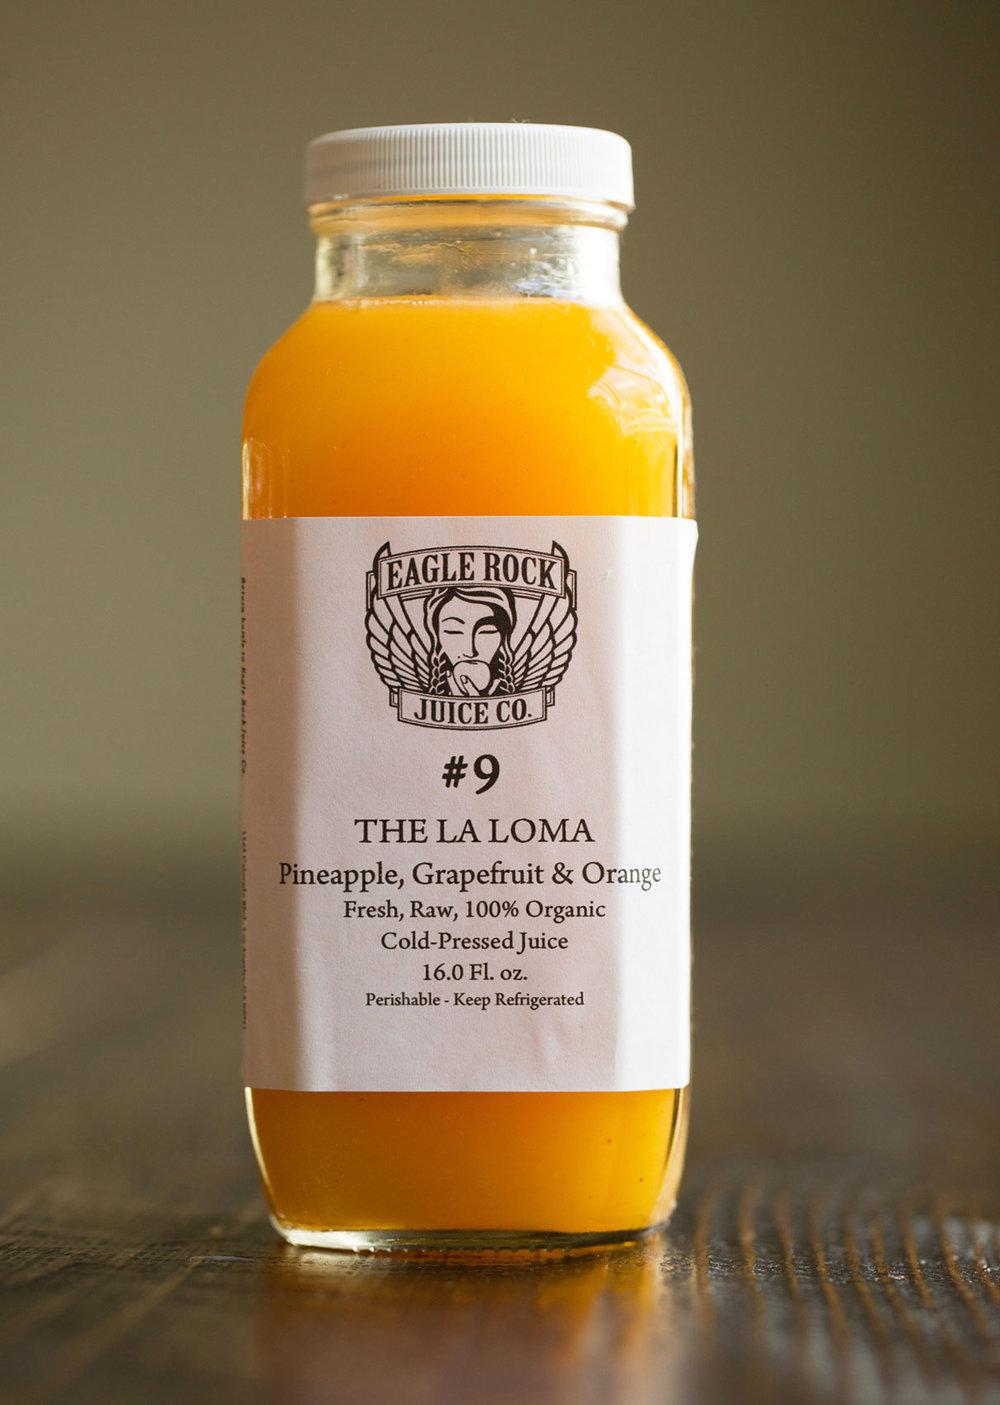 #9 The La Loma   $25.00/12.50/10.50  Pineapple, Grapefruit & Orange #9B w/ Bee Pollen  $12.75/10.75 #9C w/ Cayenne   $12.75/10.75